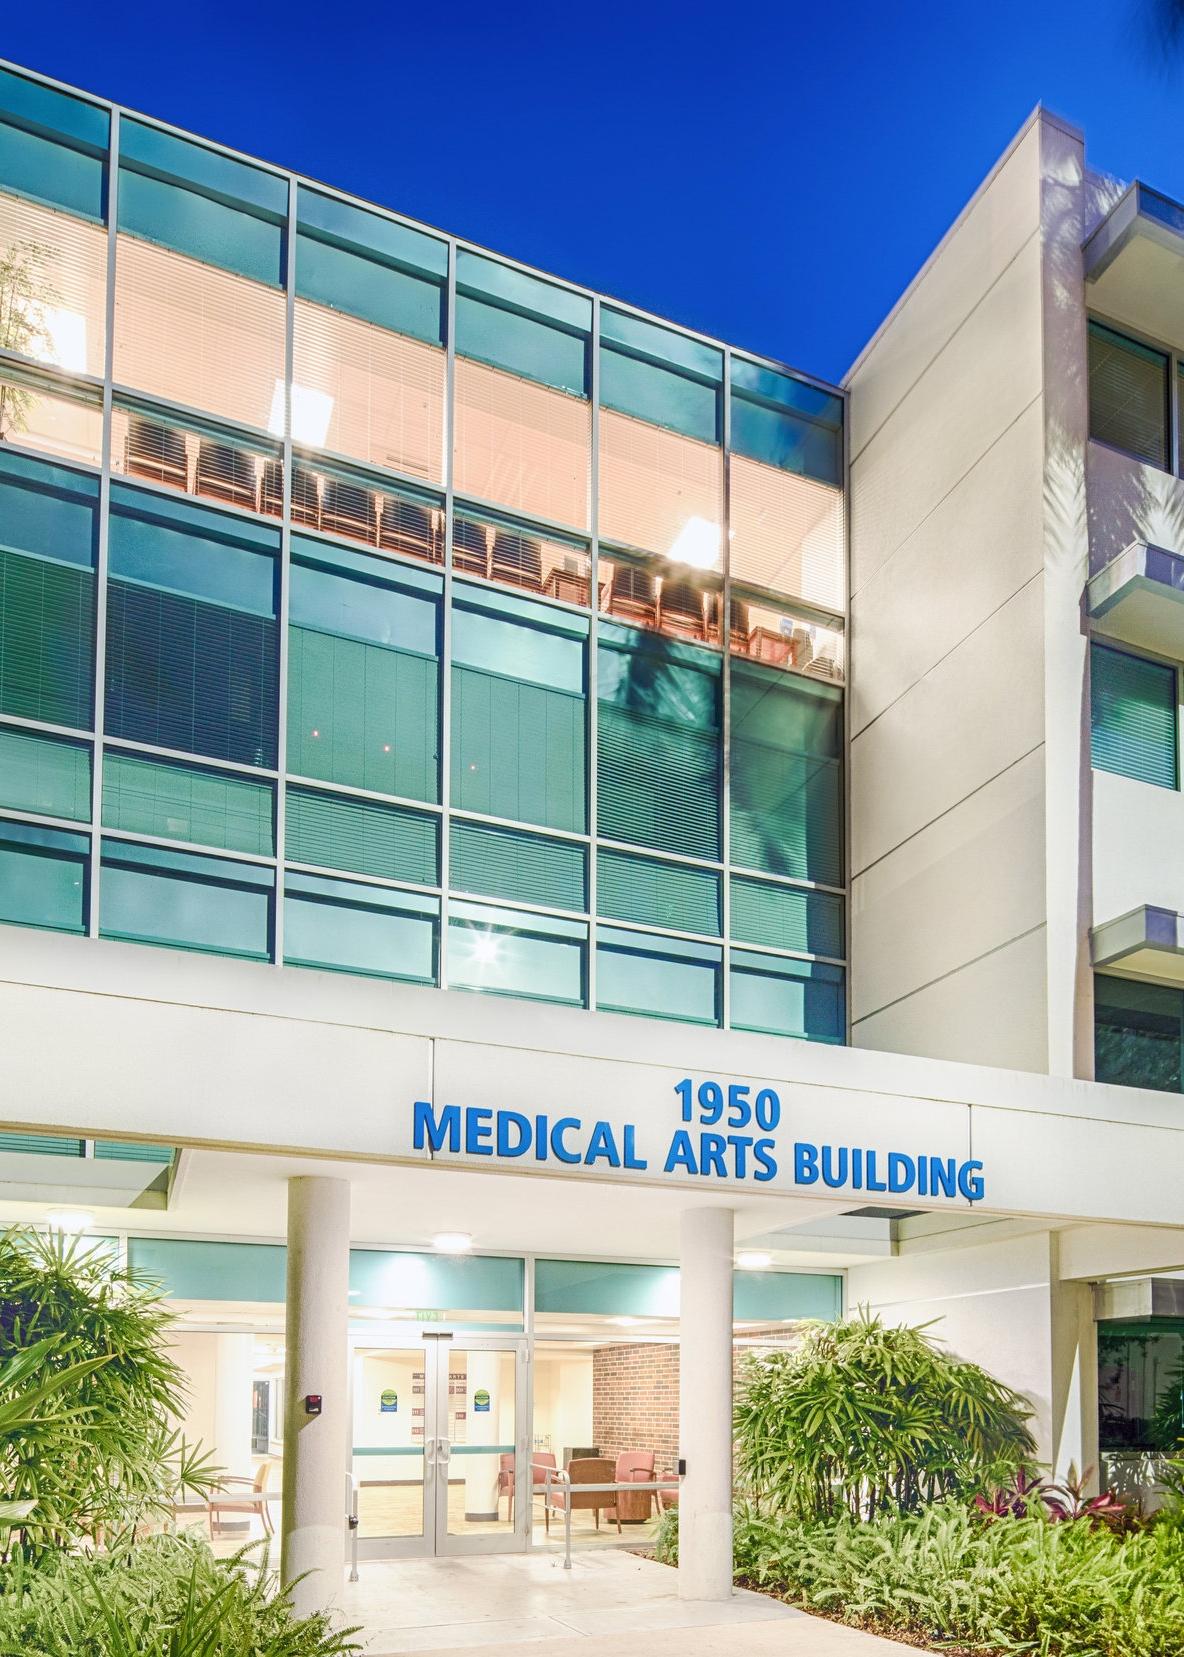 Sarasota Memorial Hospital - Medical Arts